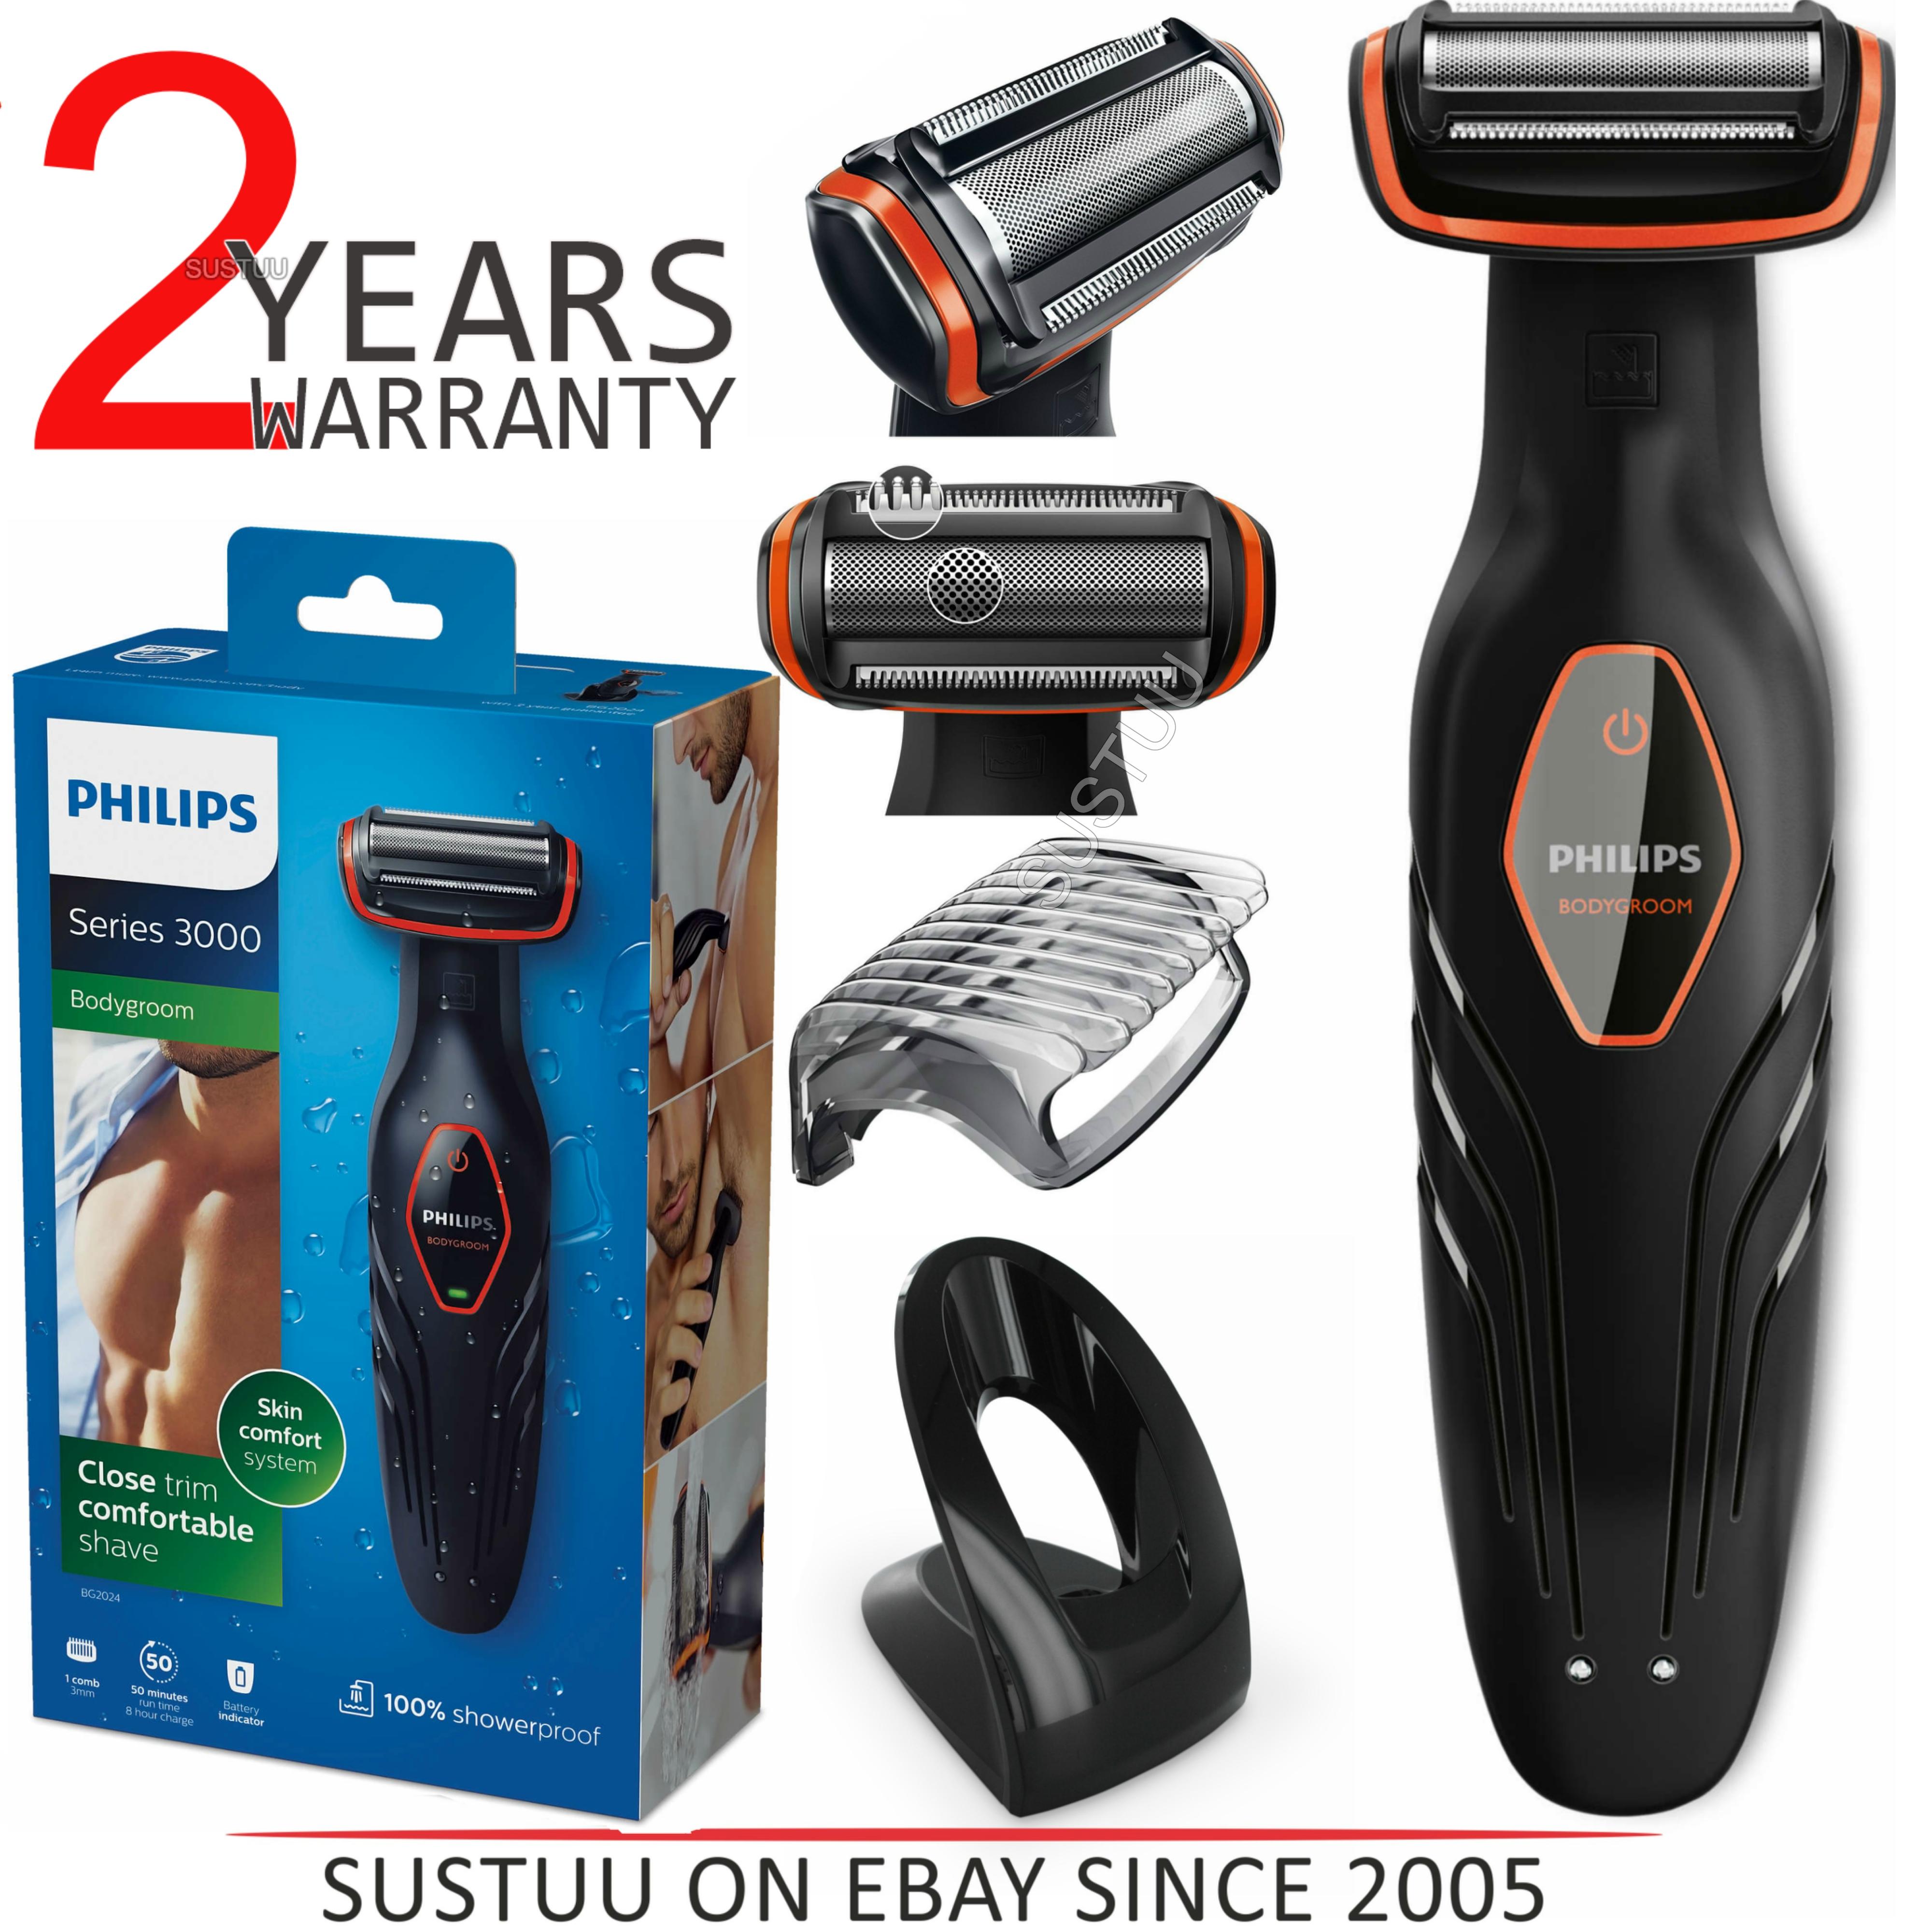 Philips Series 3000?Showerproof?Body Groomer?Hair Trim Cordless Shaver?BG2024/15